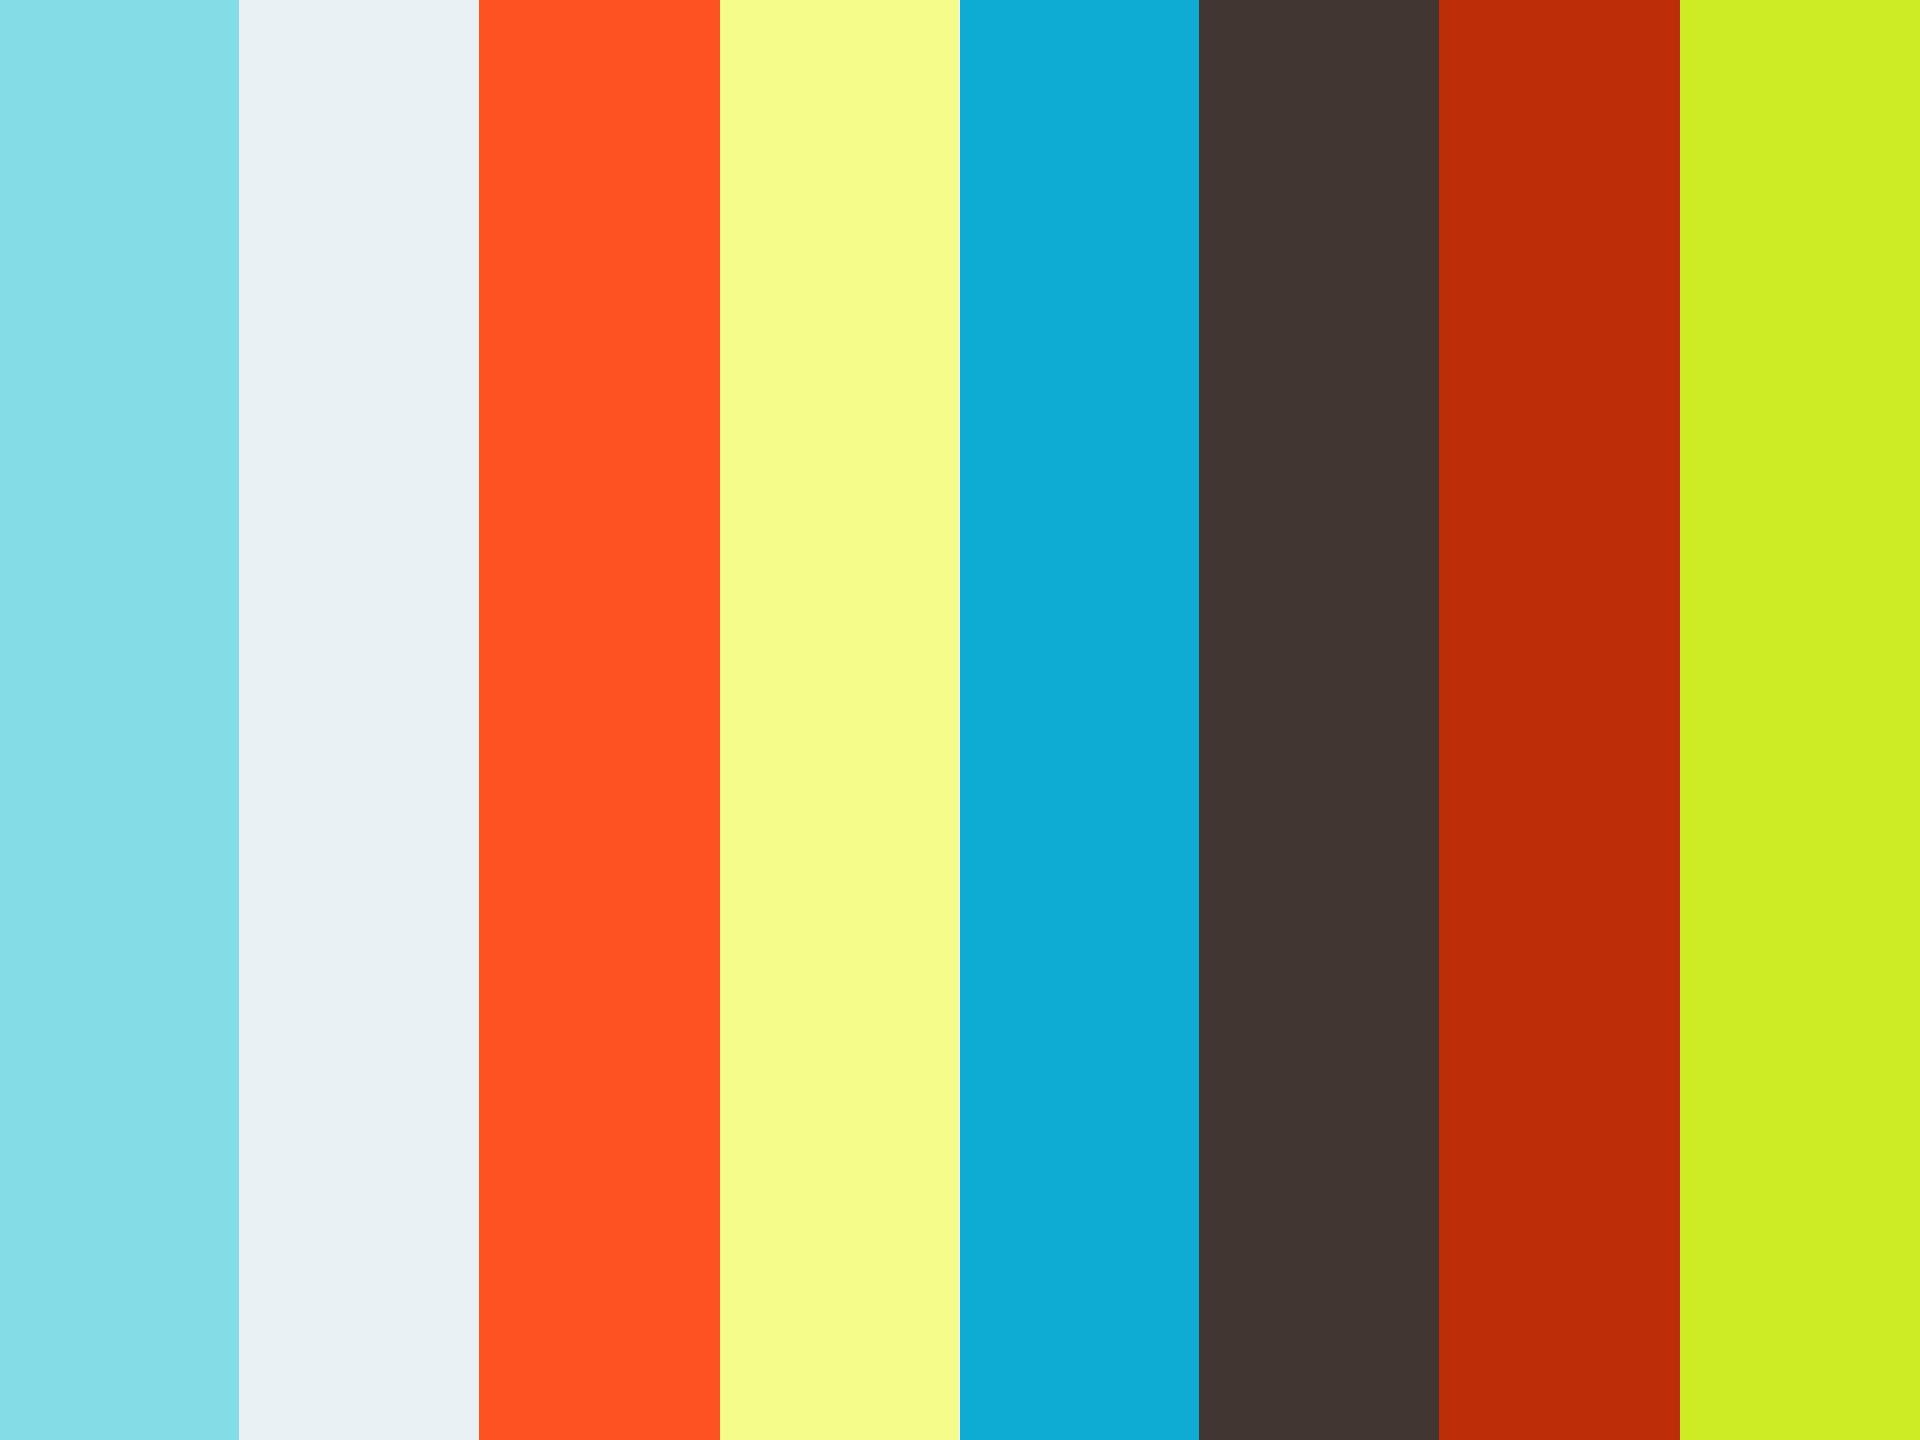 MERCEDES BENZ GLC 250 - RED - 2016